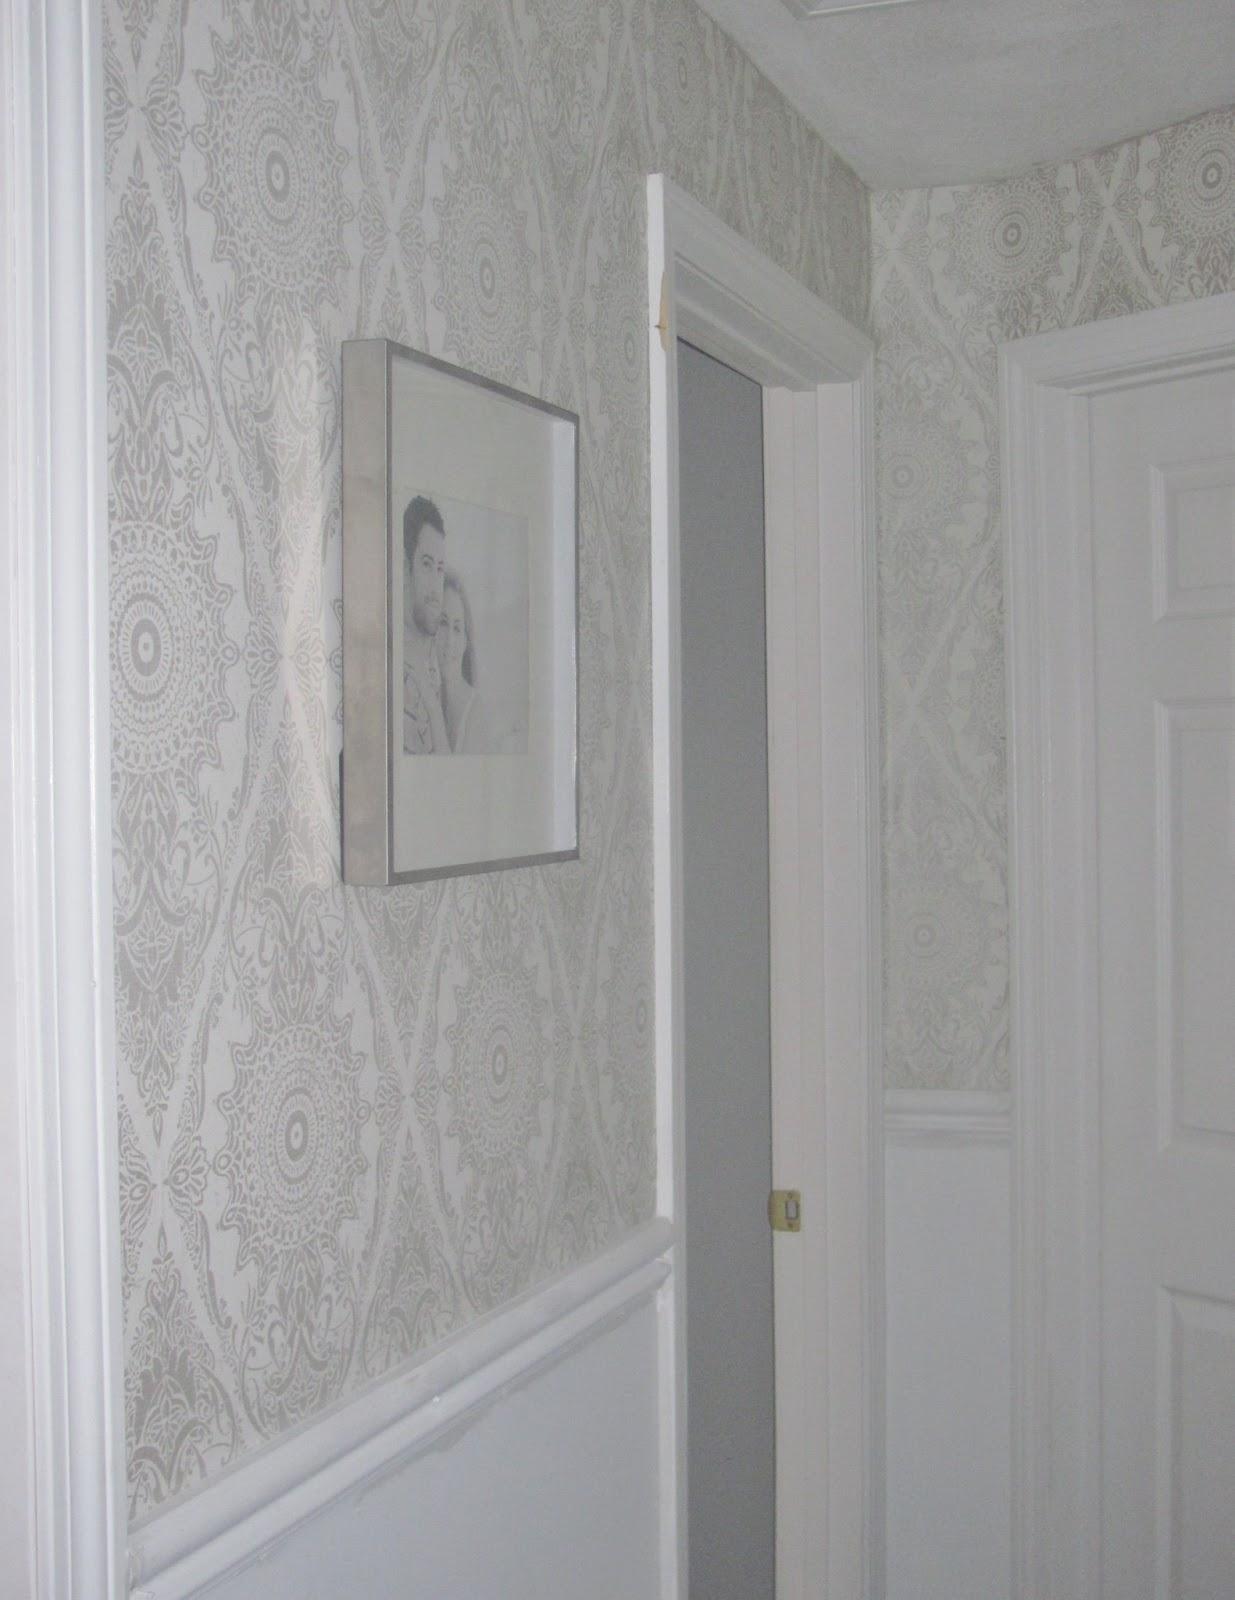 Deirdre desrosiers interiors wallpaper in hallway for Hallway wallpaper